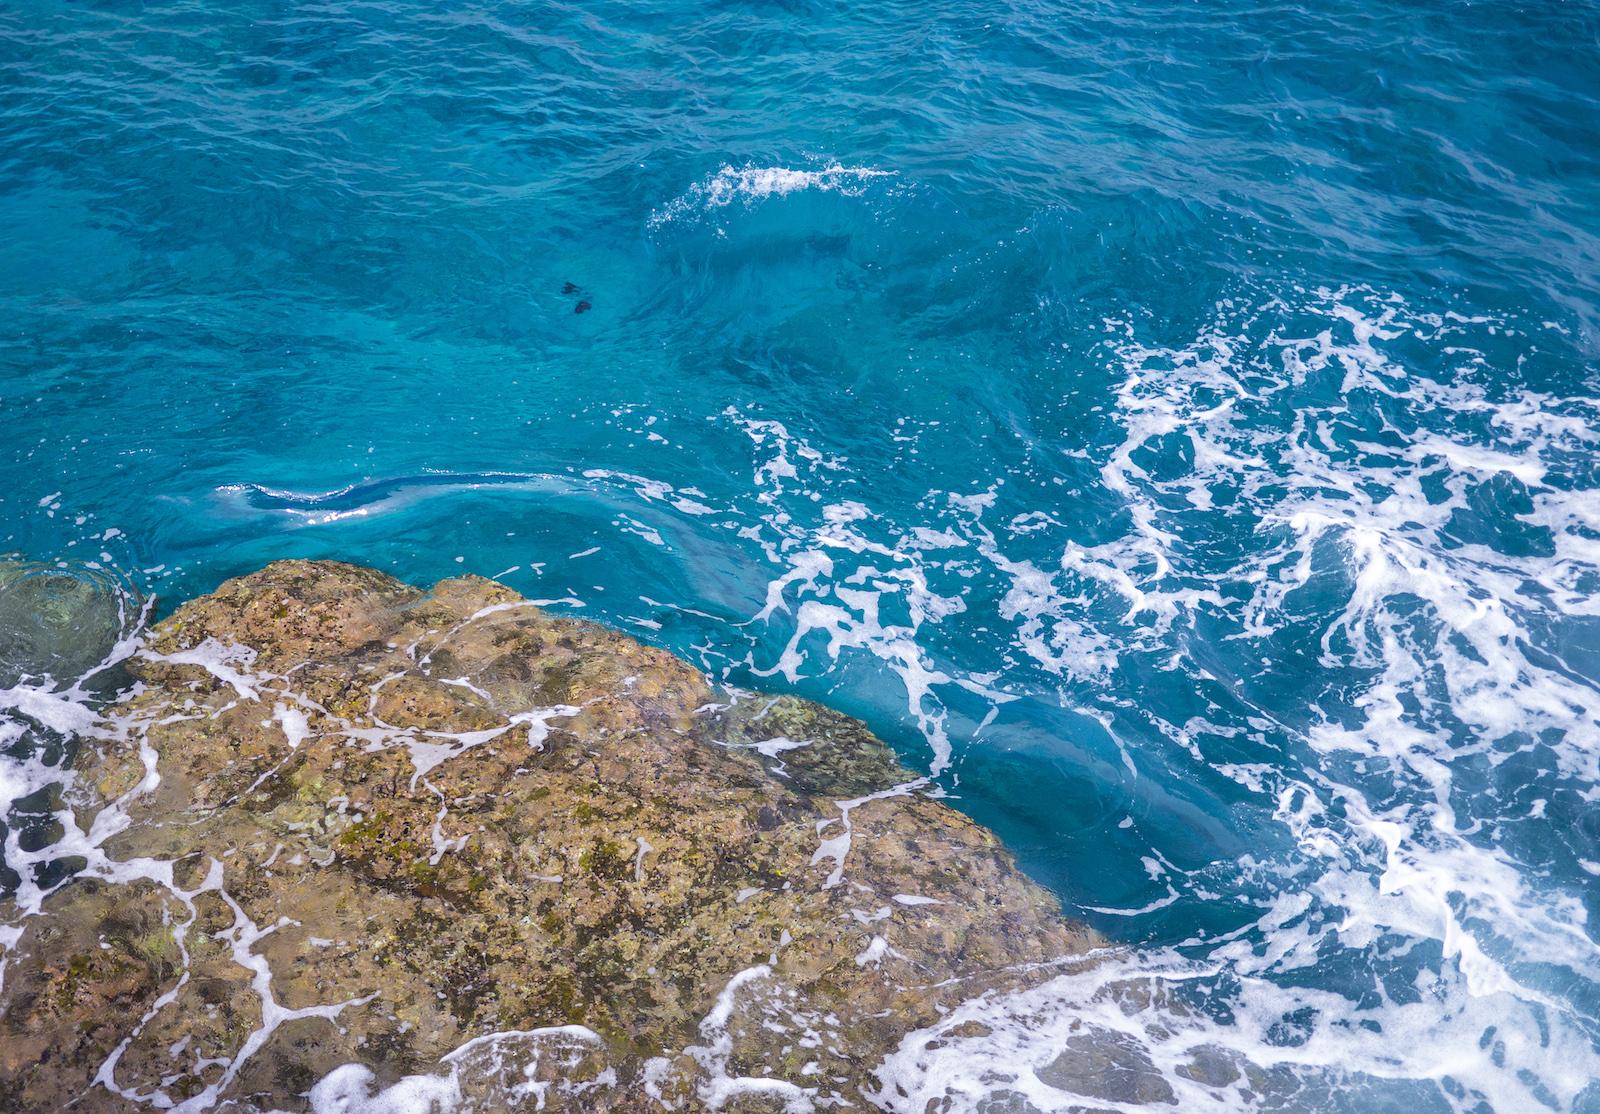 Hawaiian water crashes against the rocks